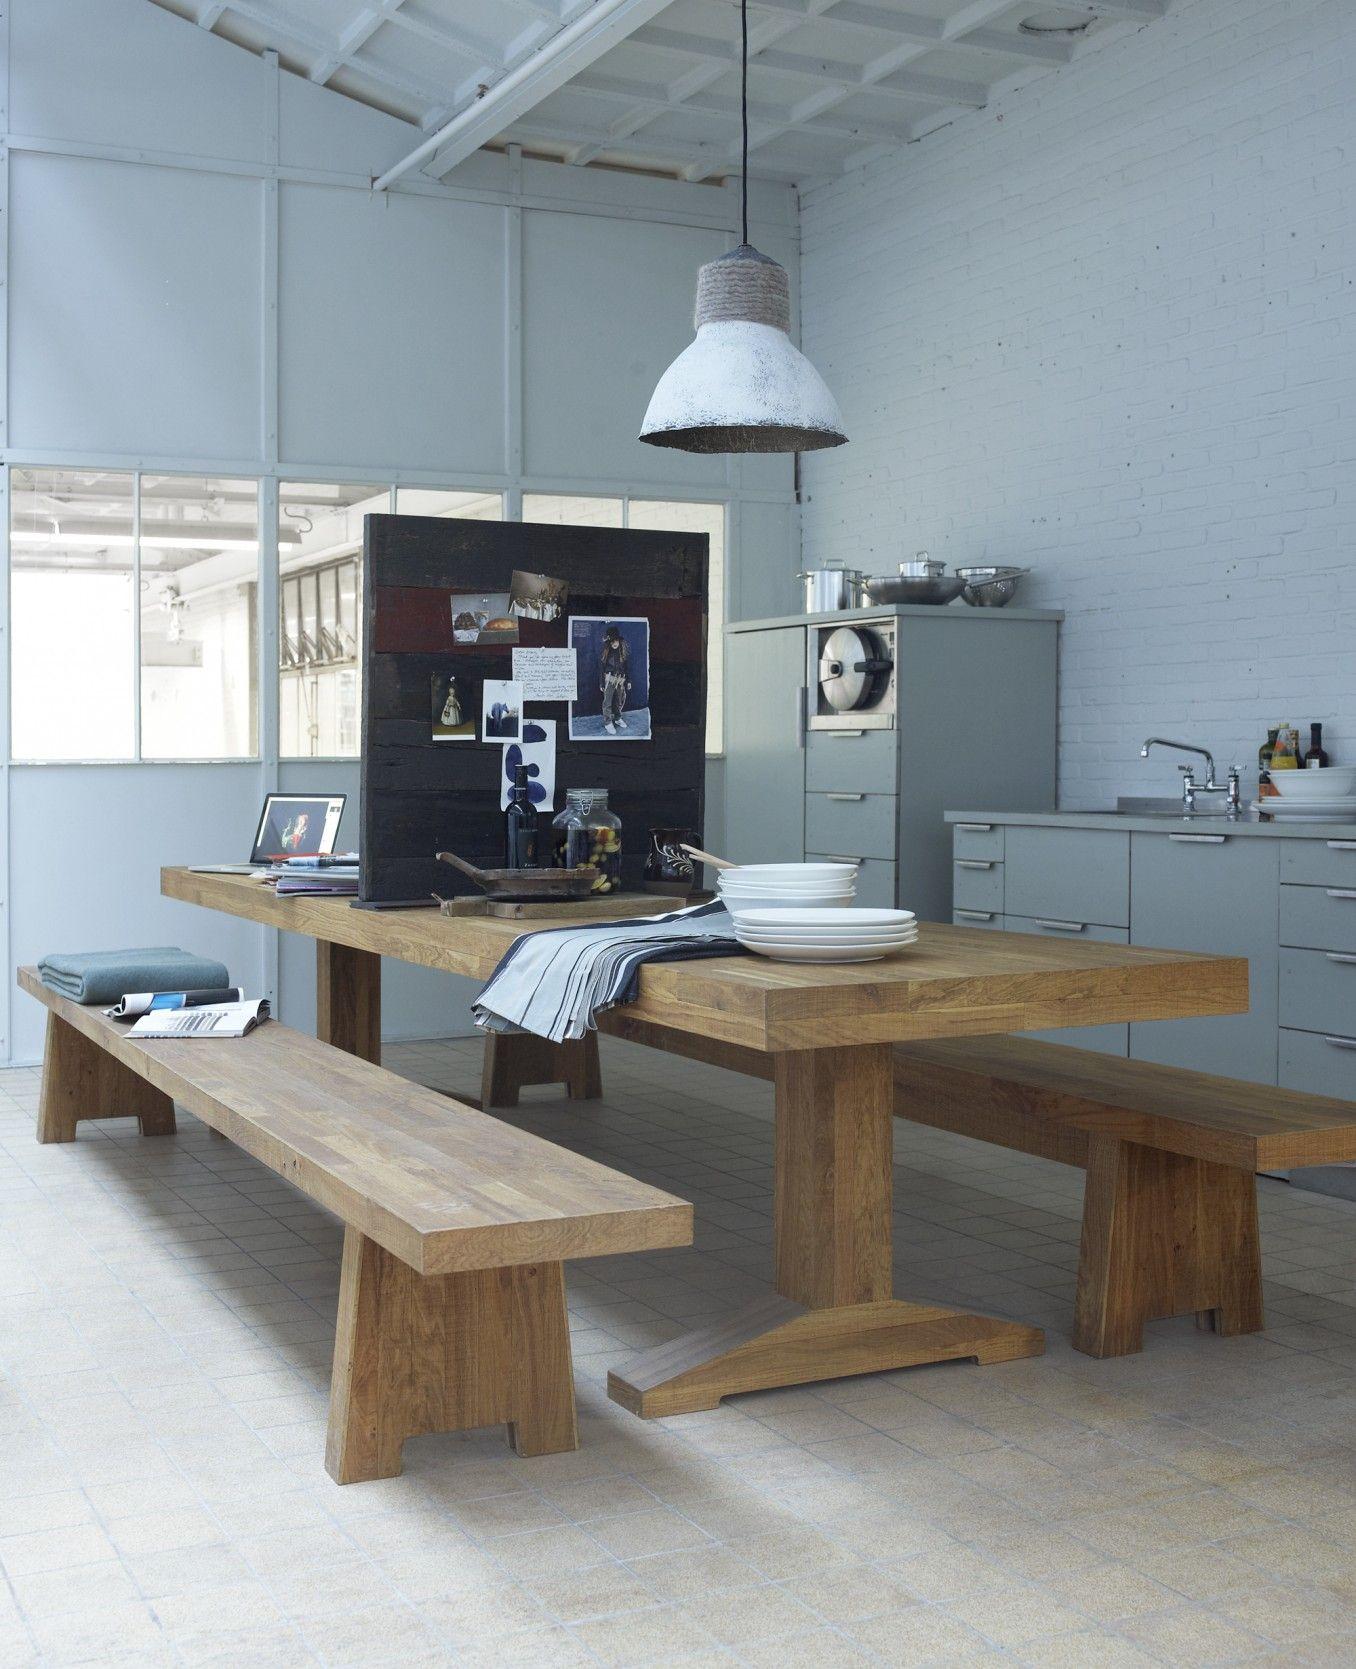 houten eettafel bank | keuken | Pinterest | Cosy, Tables and House